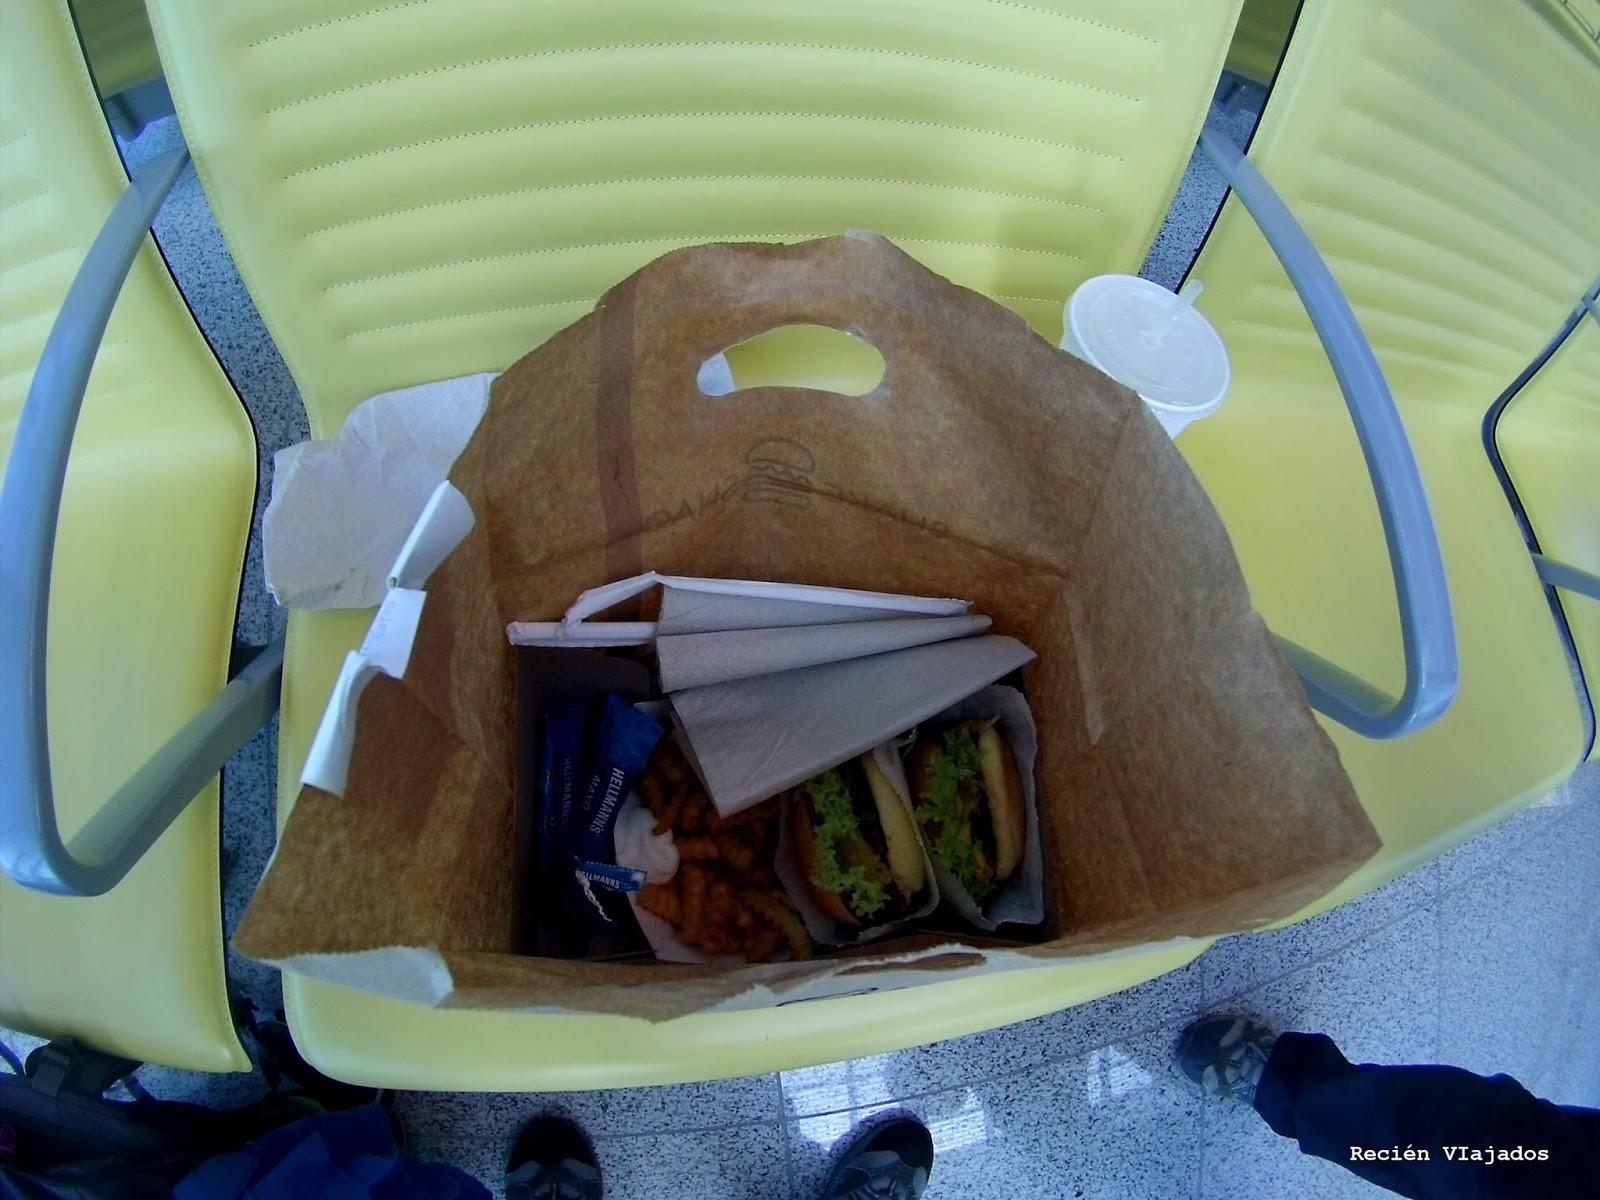 Hamburguesas del Shake Shak compradas en el aeropuerto de Dubai